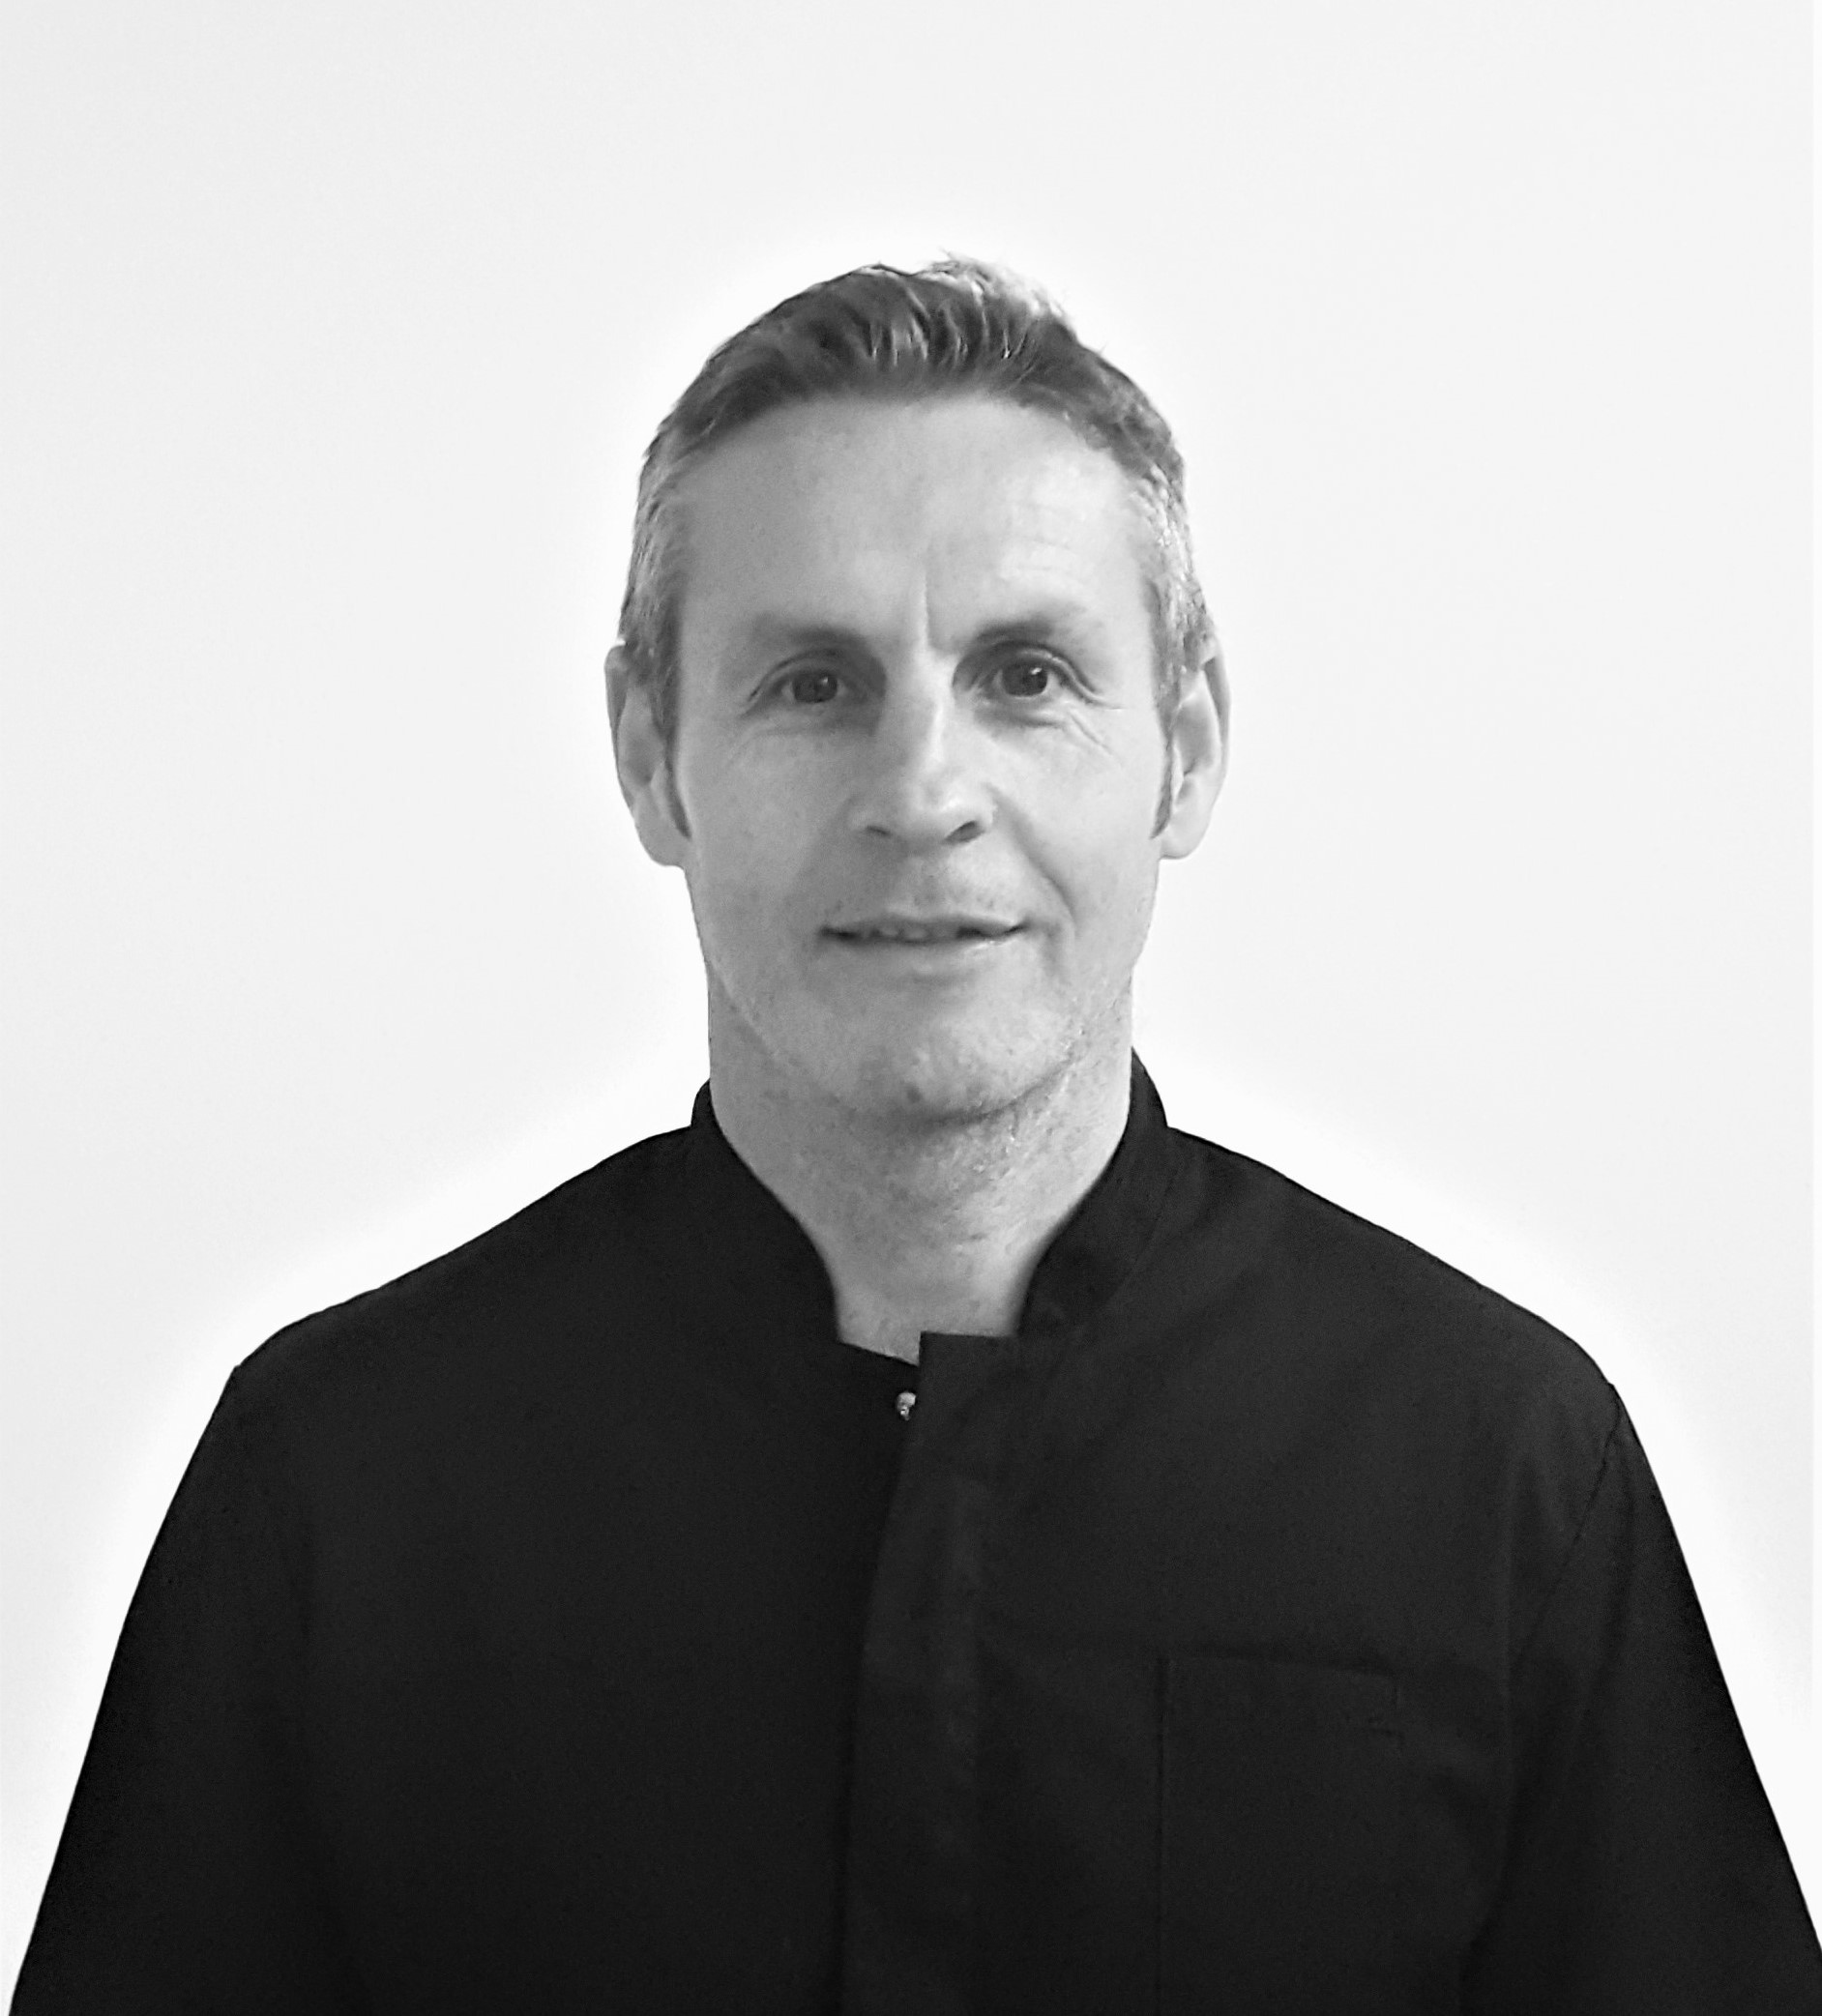 Alan MacInnes